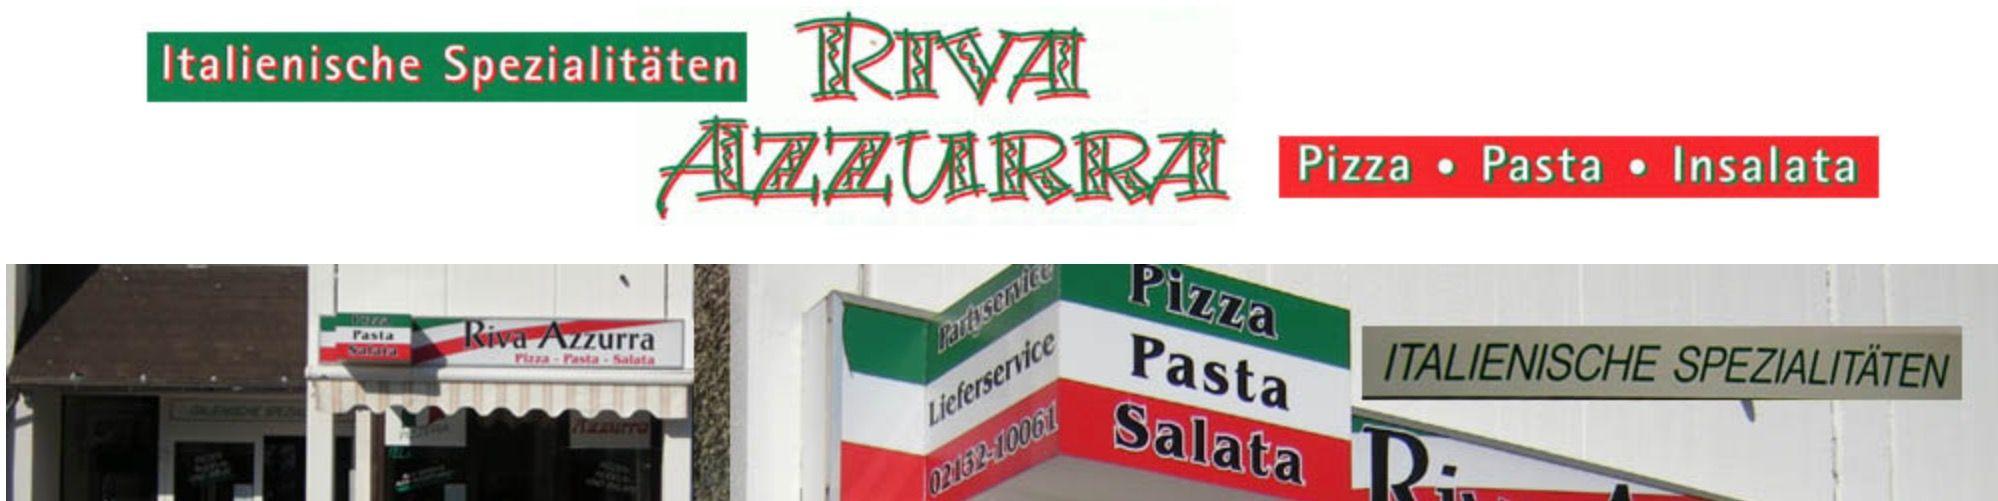 Titelbild von Riva Azzurra